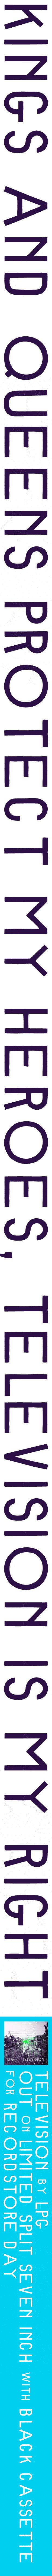 LPG - TELEVISION banner